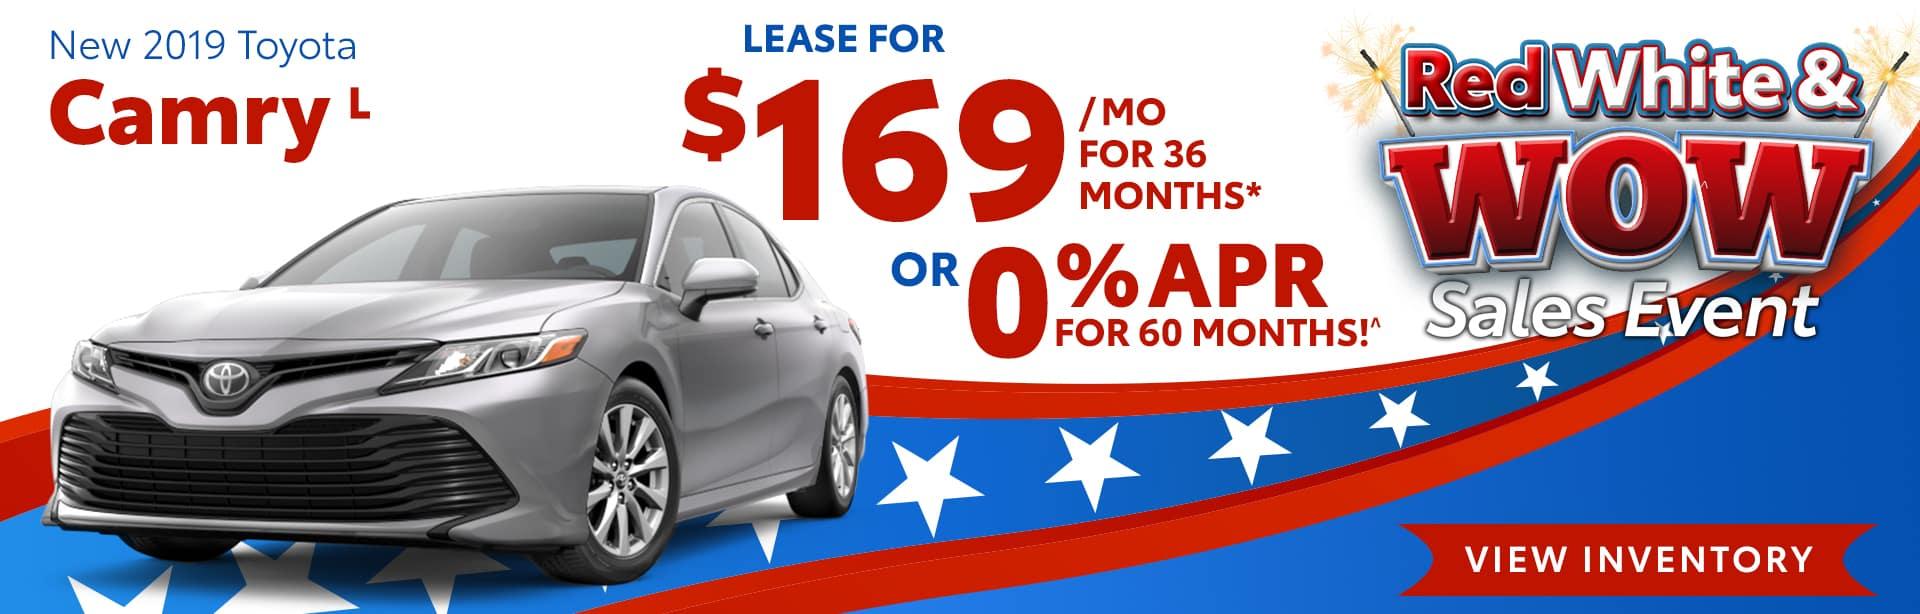 Toyota Dealership San Antonio Tx >> Toyota Dealership Financing Service Parts Bastrop Tx Serving